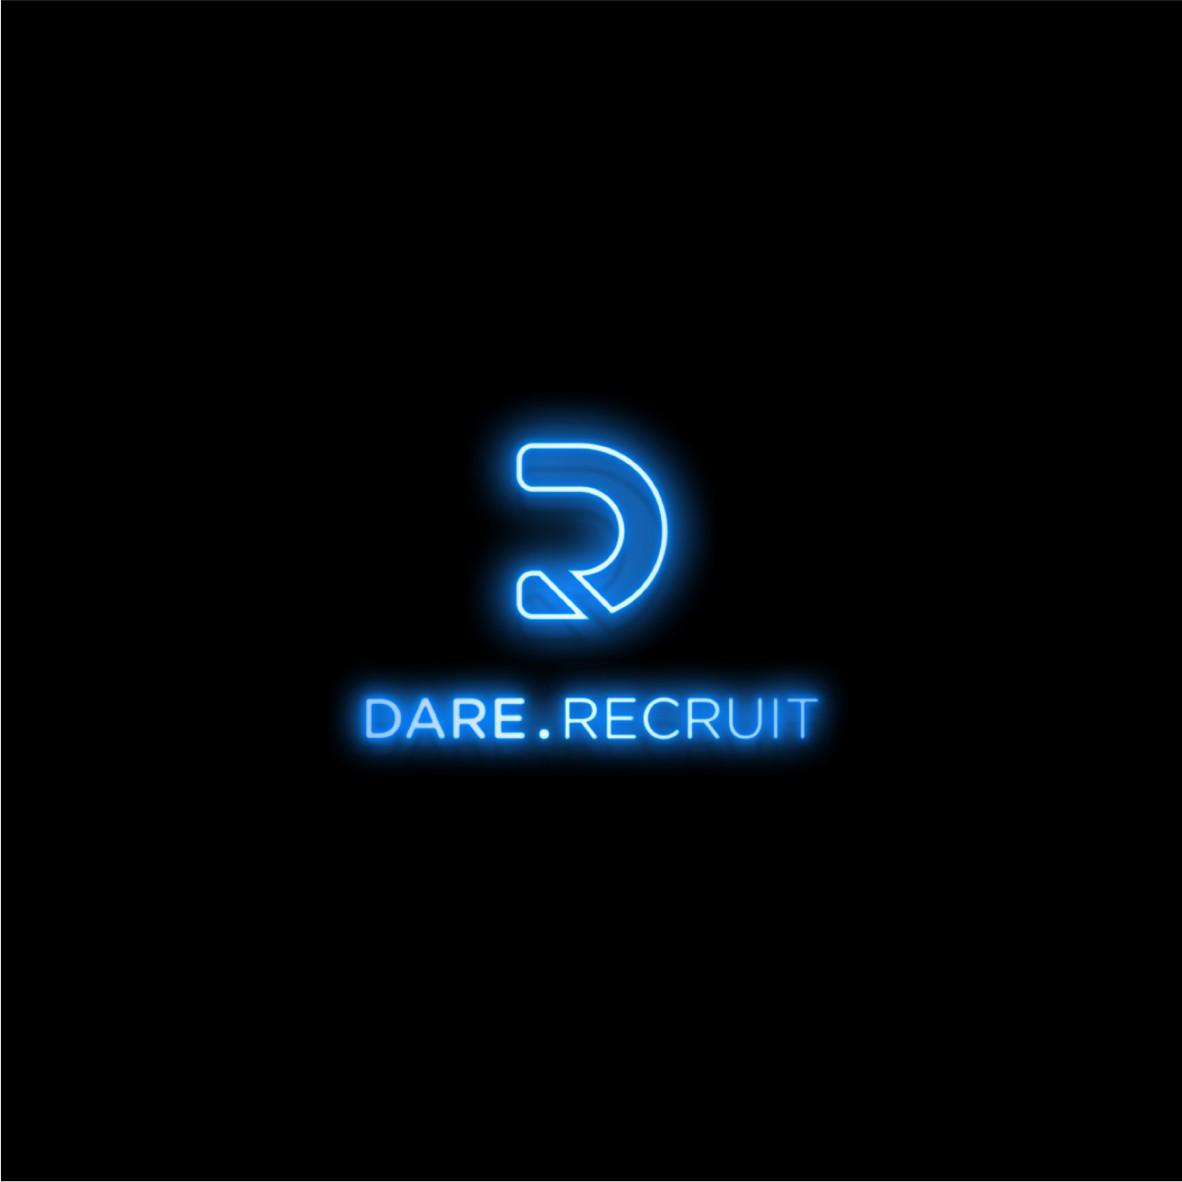 A recruitment start up to help recruitment start ups needs new logo and brand identity